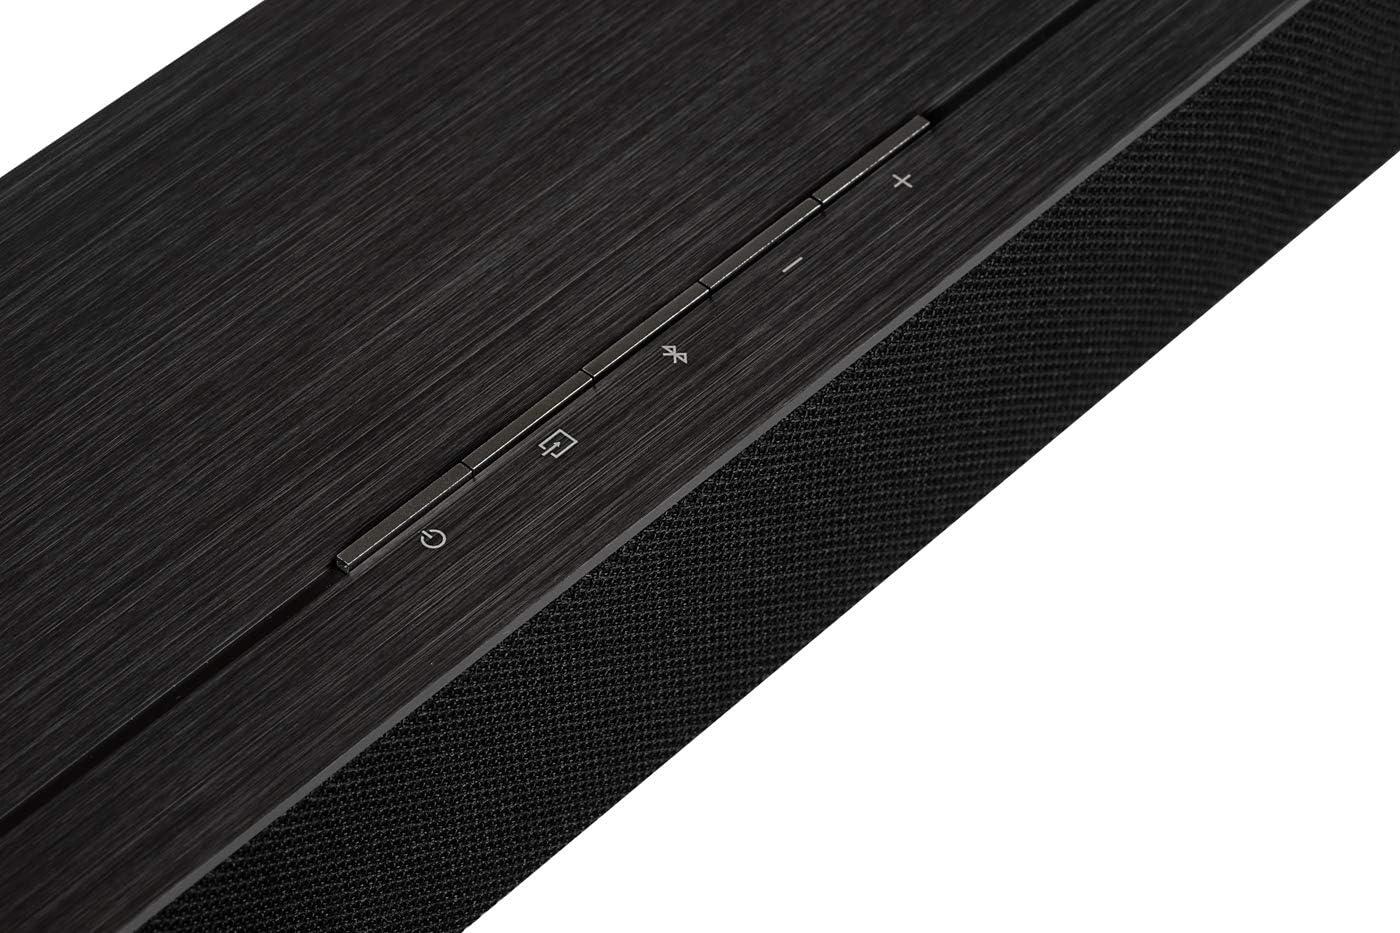 sound-bar-controls